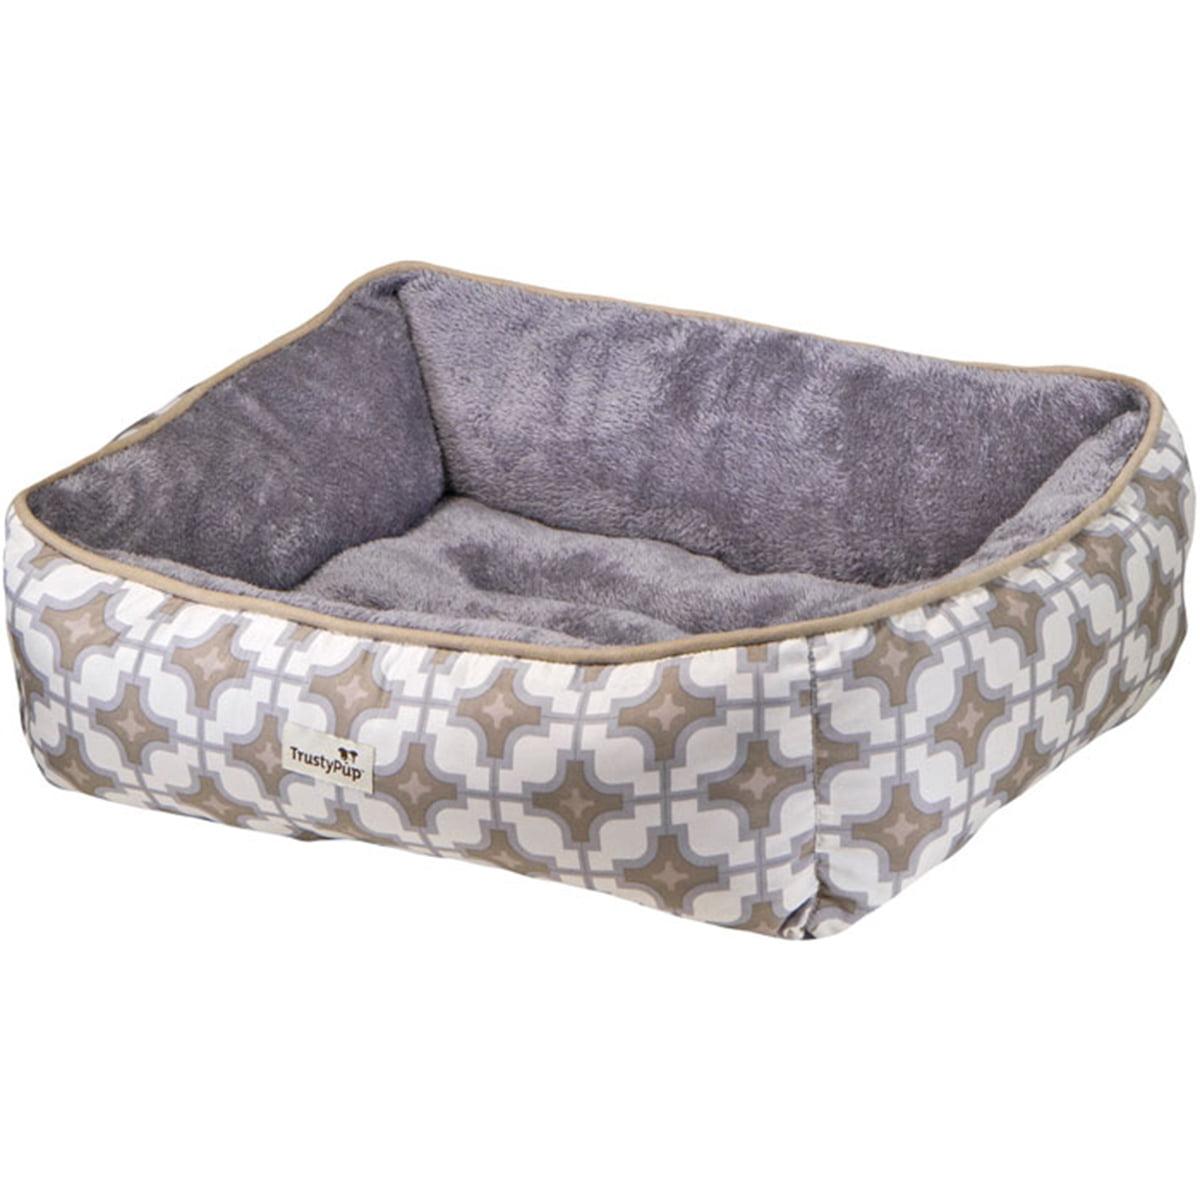 "trustypup dreamluxe dog bed, medium, 25"" x 21"", tan - walmart"